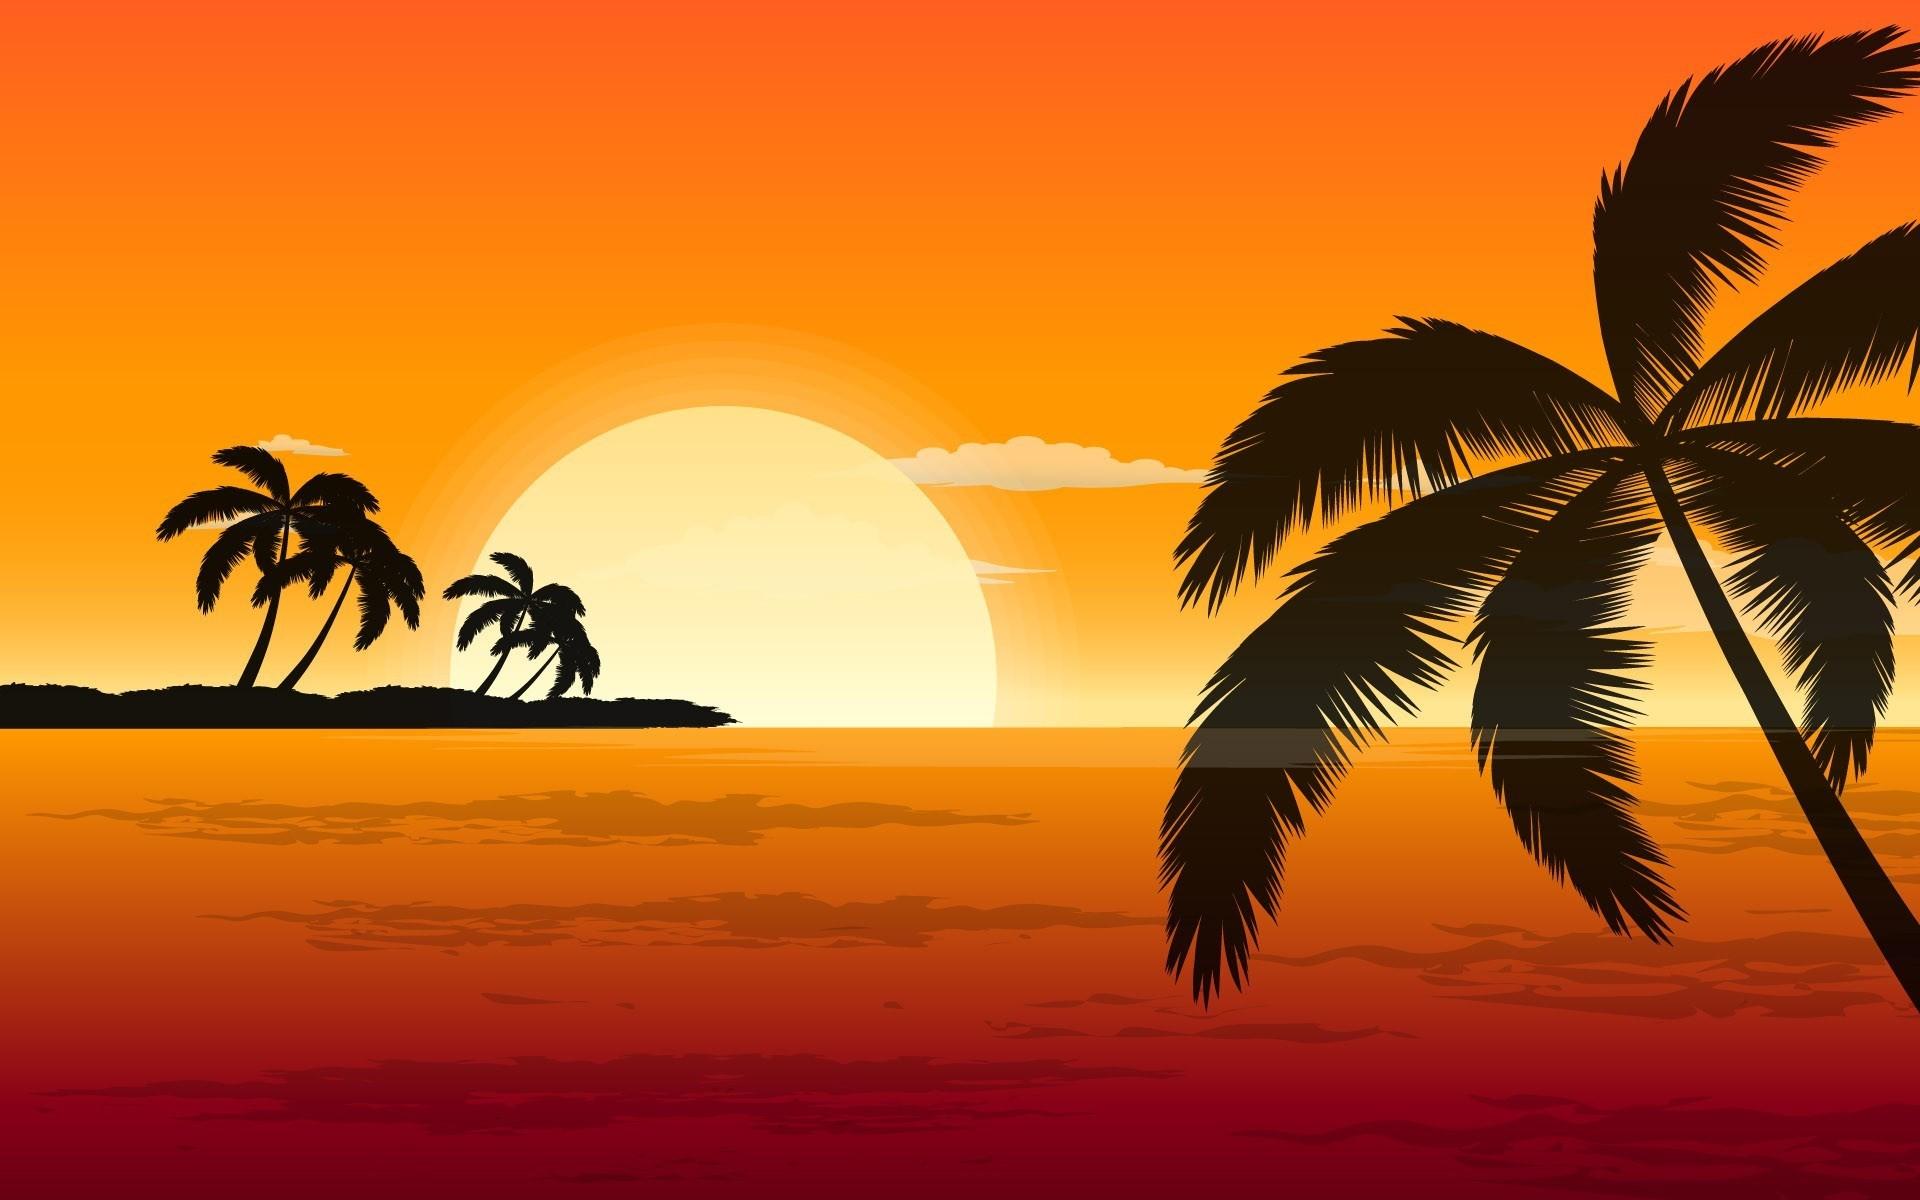 sunset orange vector shadows palm trees fresh new hd wallpaper